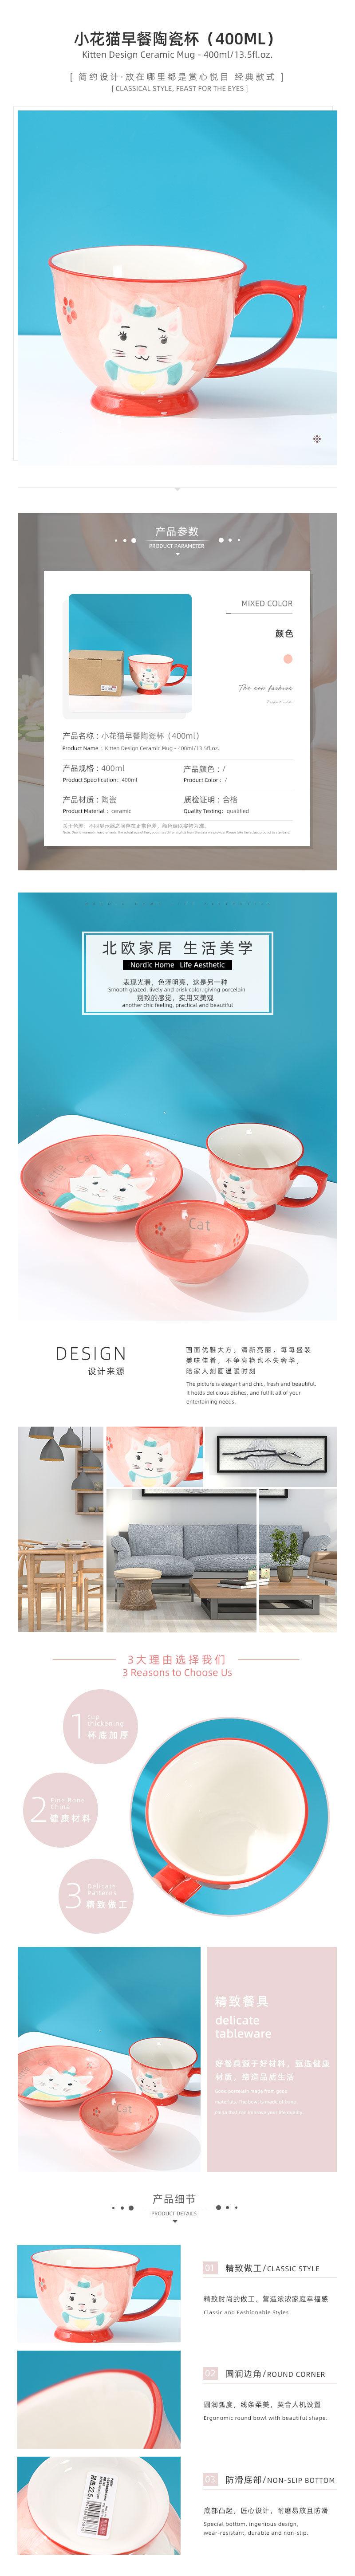 Kitten Design Ceramic Mug - 400ml/13.5fl.oz.